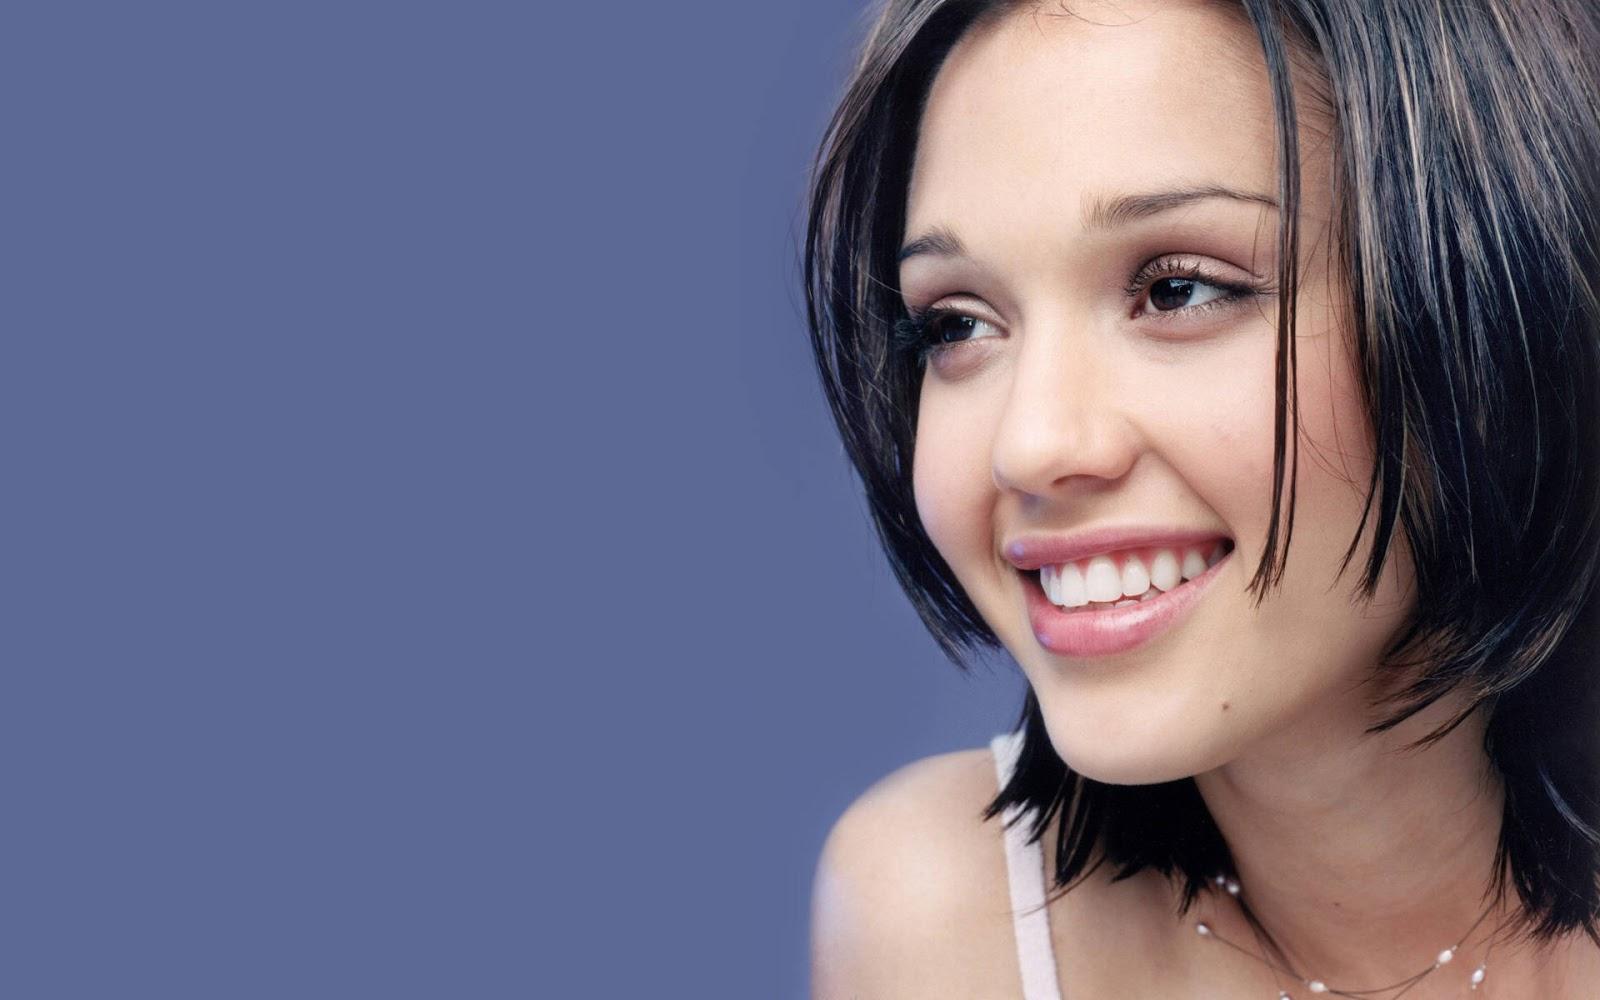 Wallpaper Cute Faces Women-7517